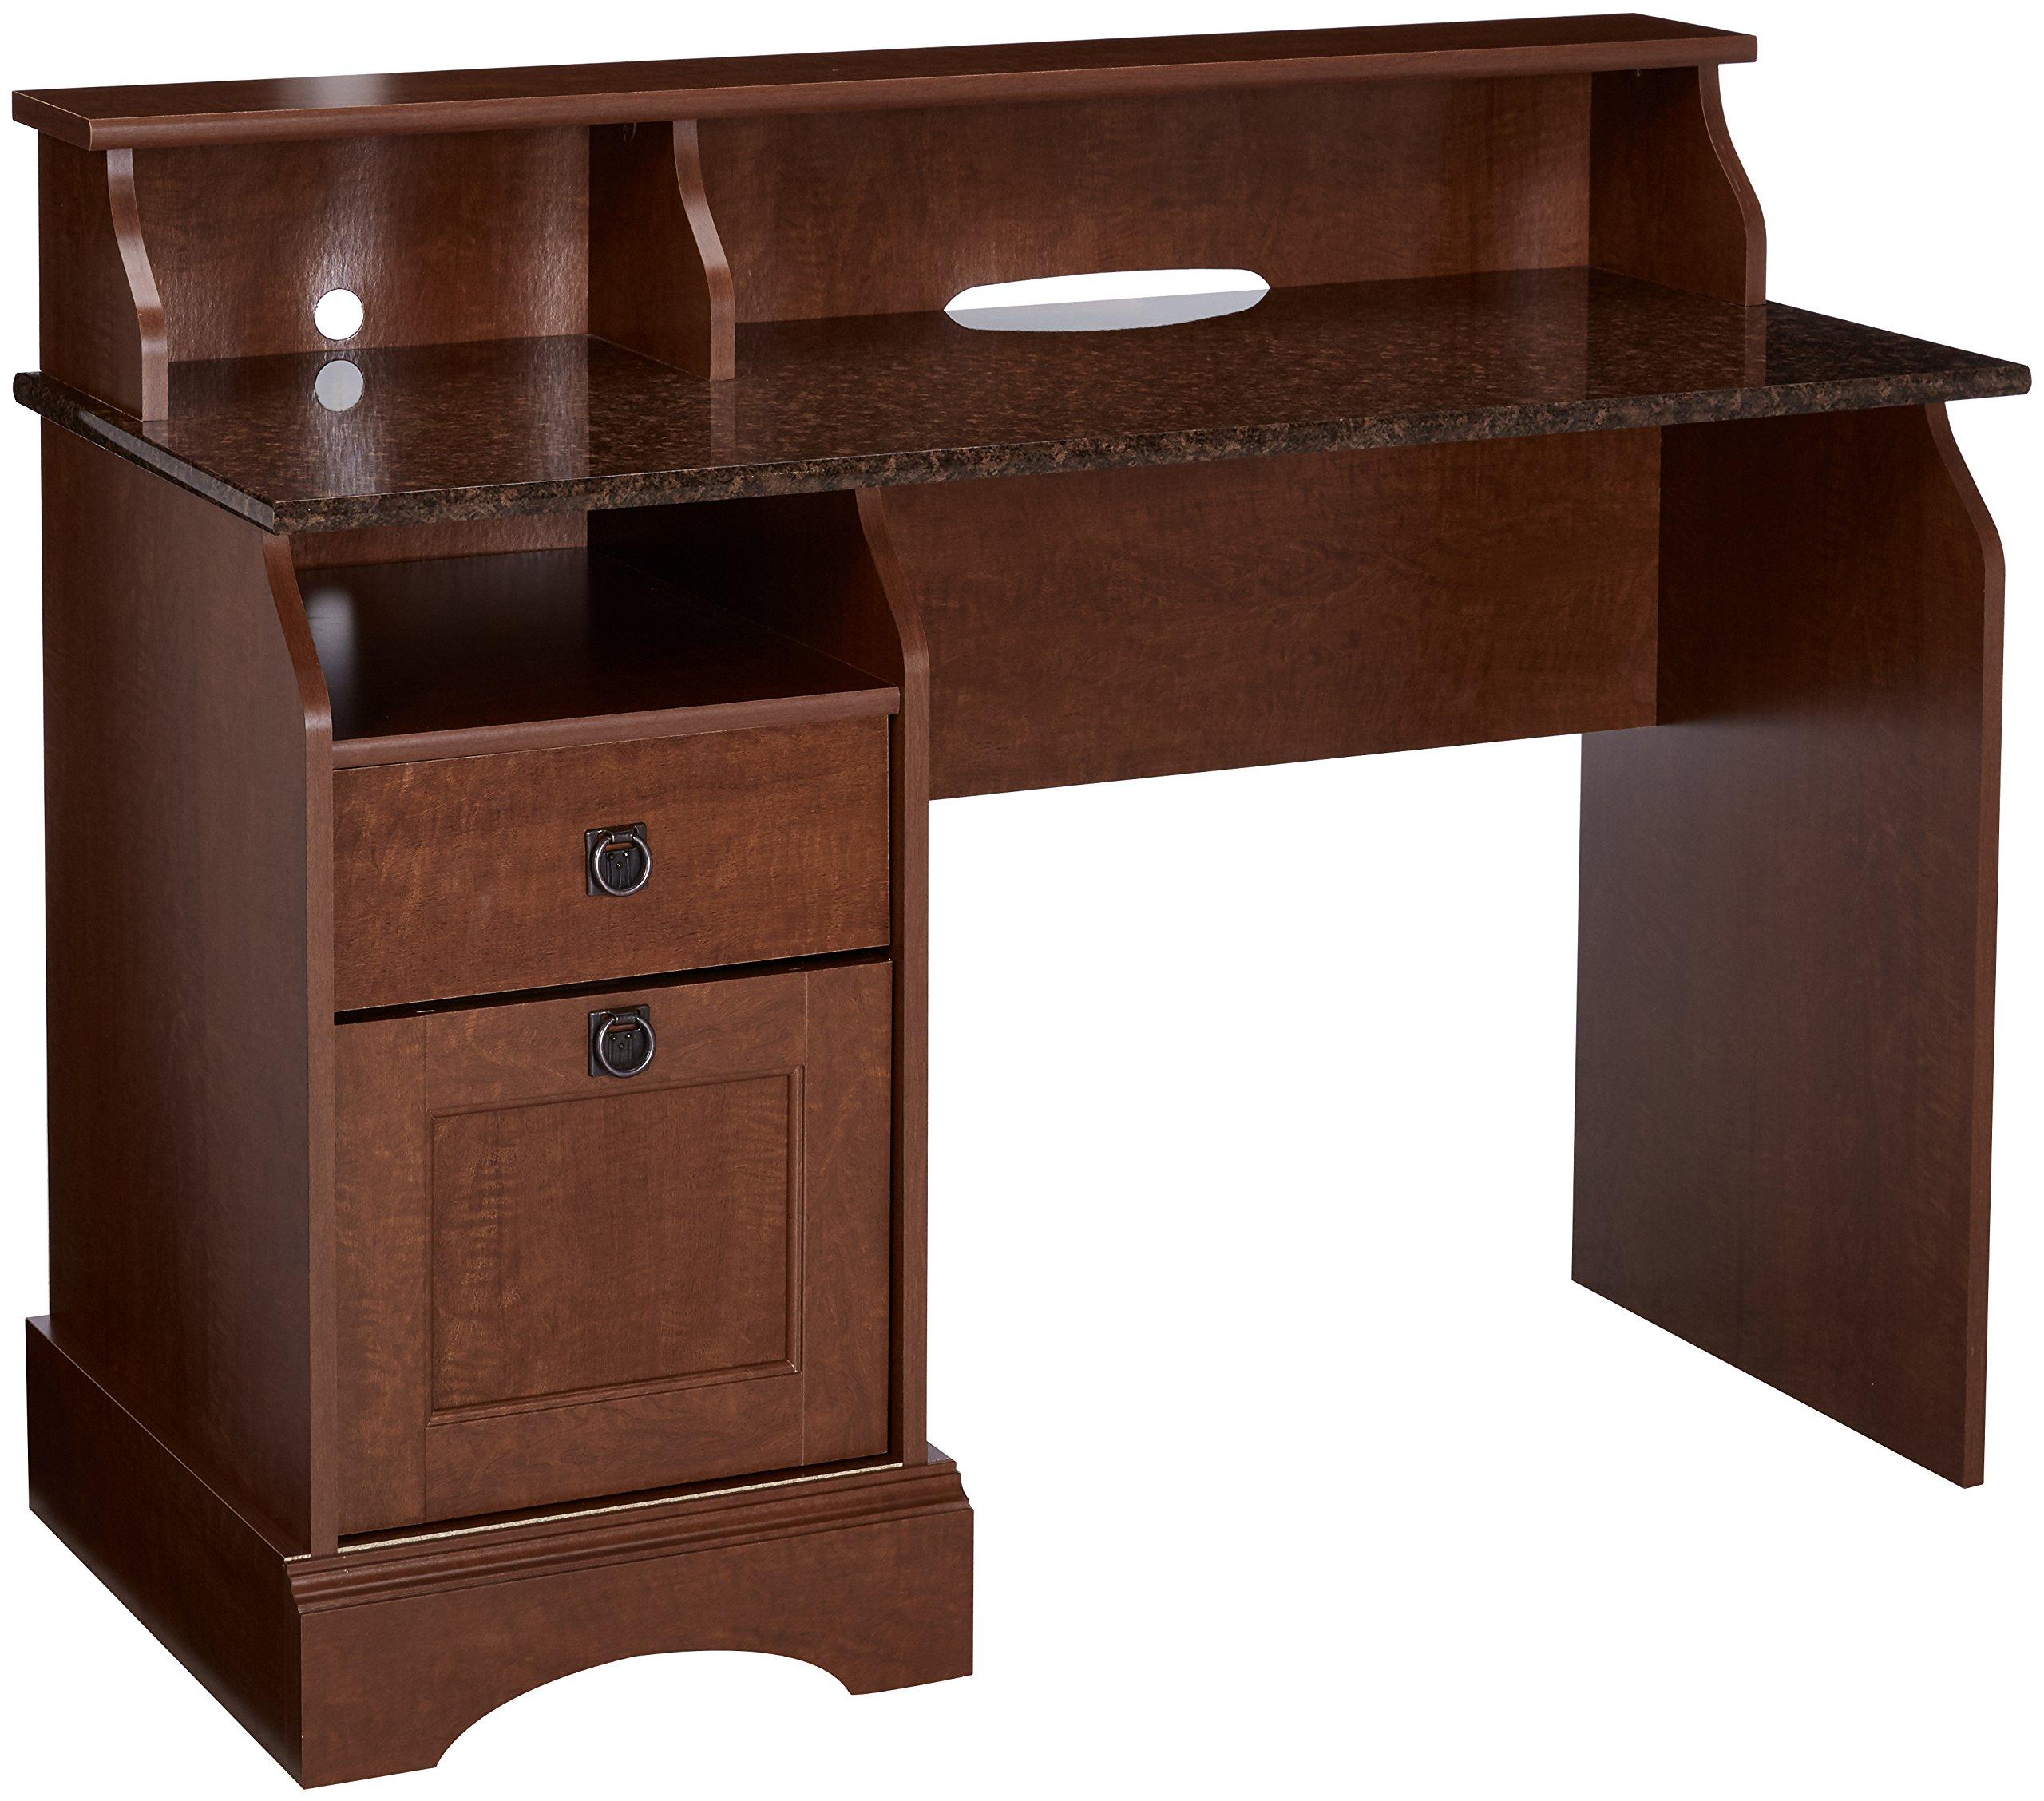 Sauder Graham Hill Desk, Autumn Maple Finish